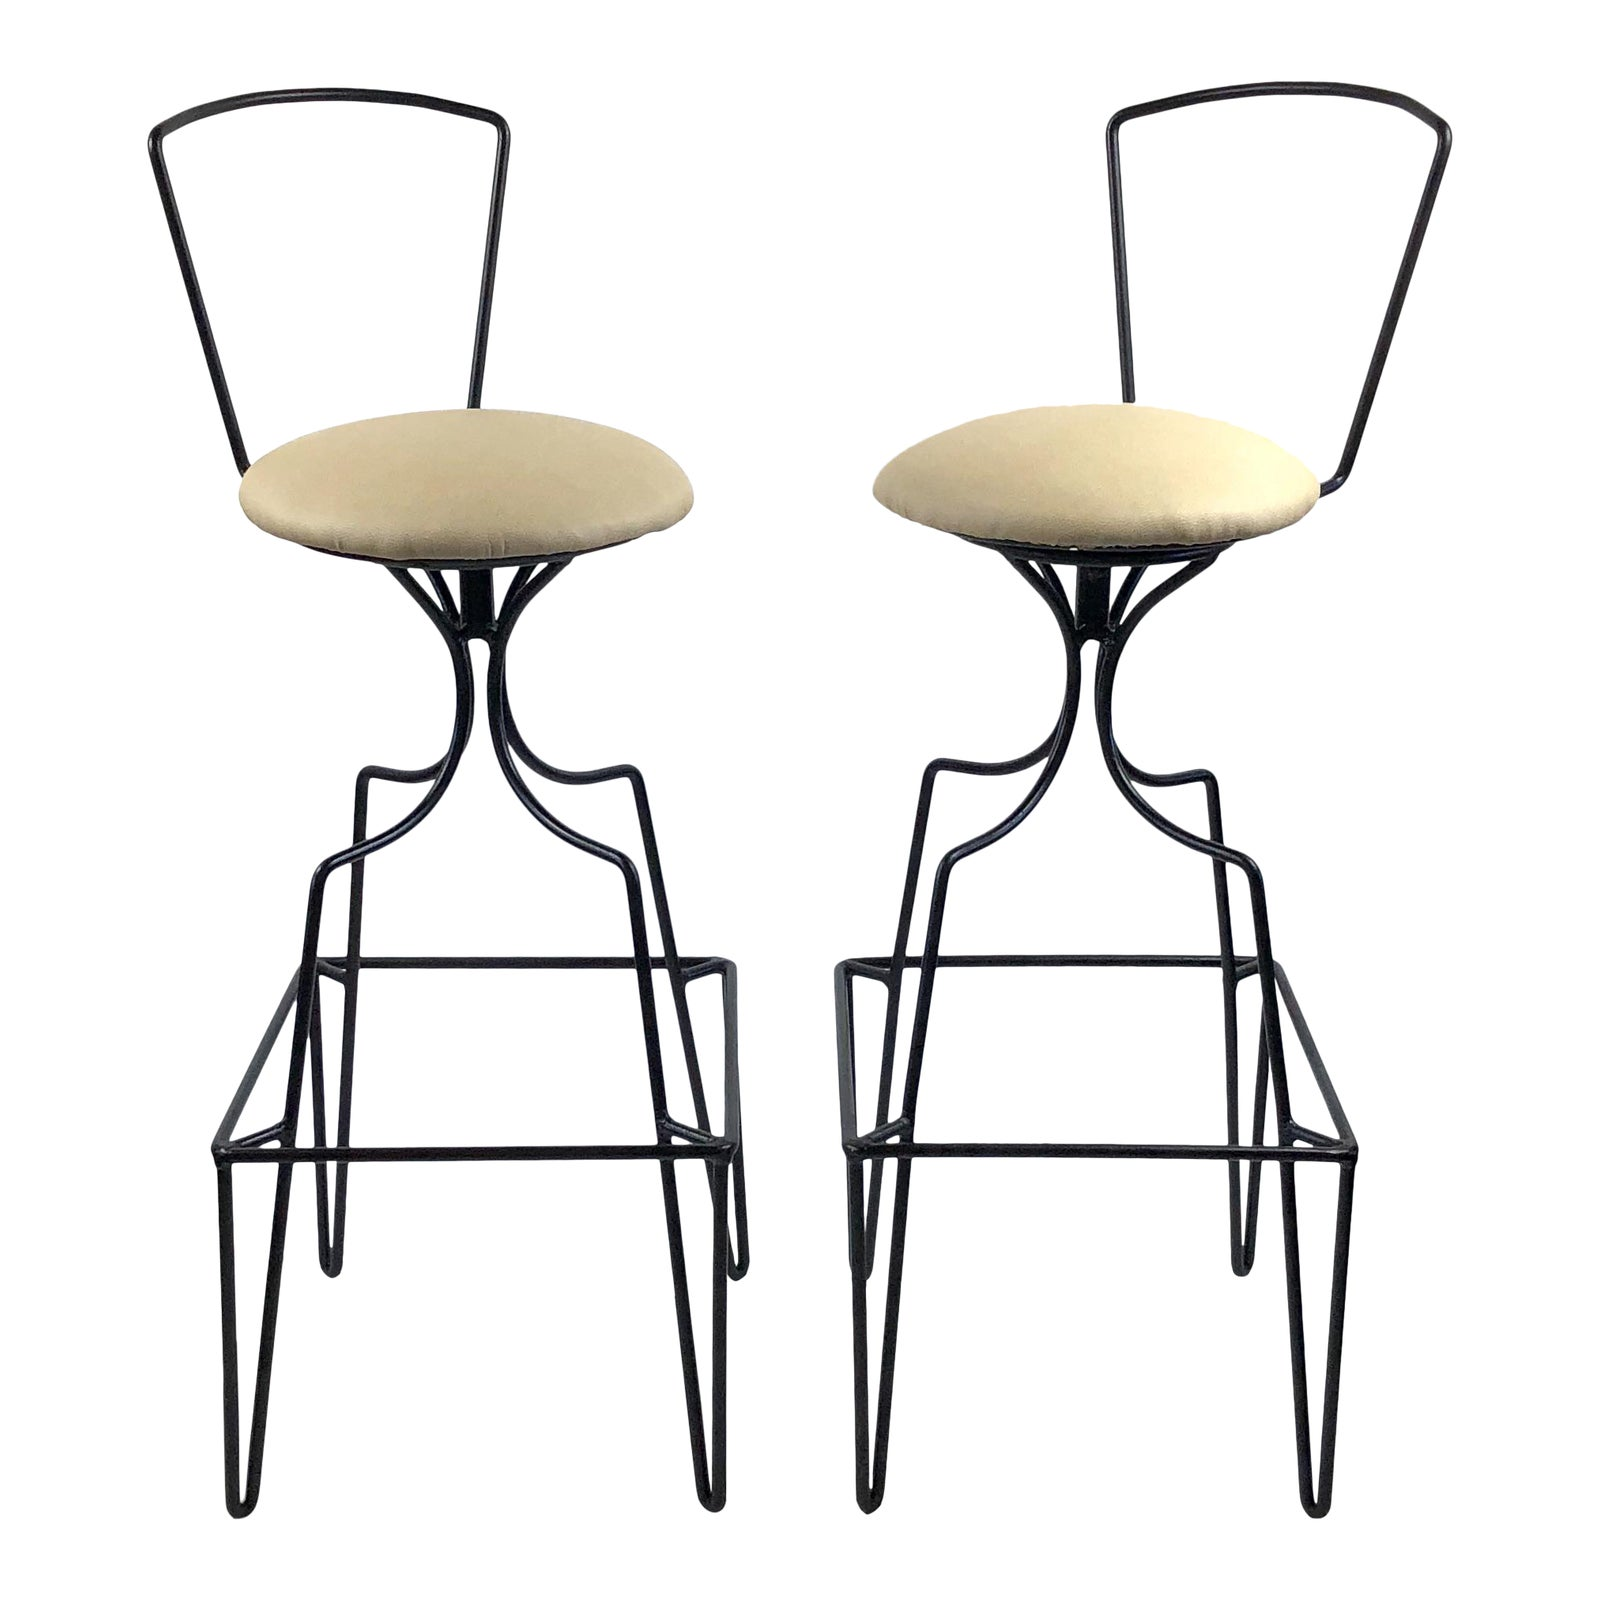 Groovy Mid Century Wrought Iron Swivel Bar Stools A Pair Customarchery Wood Chair Design Ideas Customarcherynet